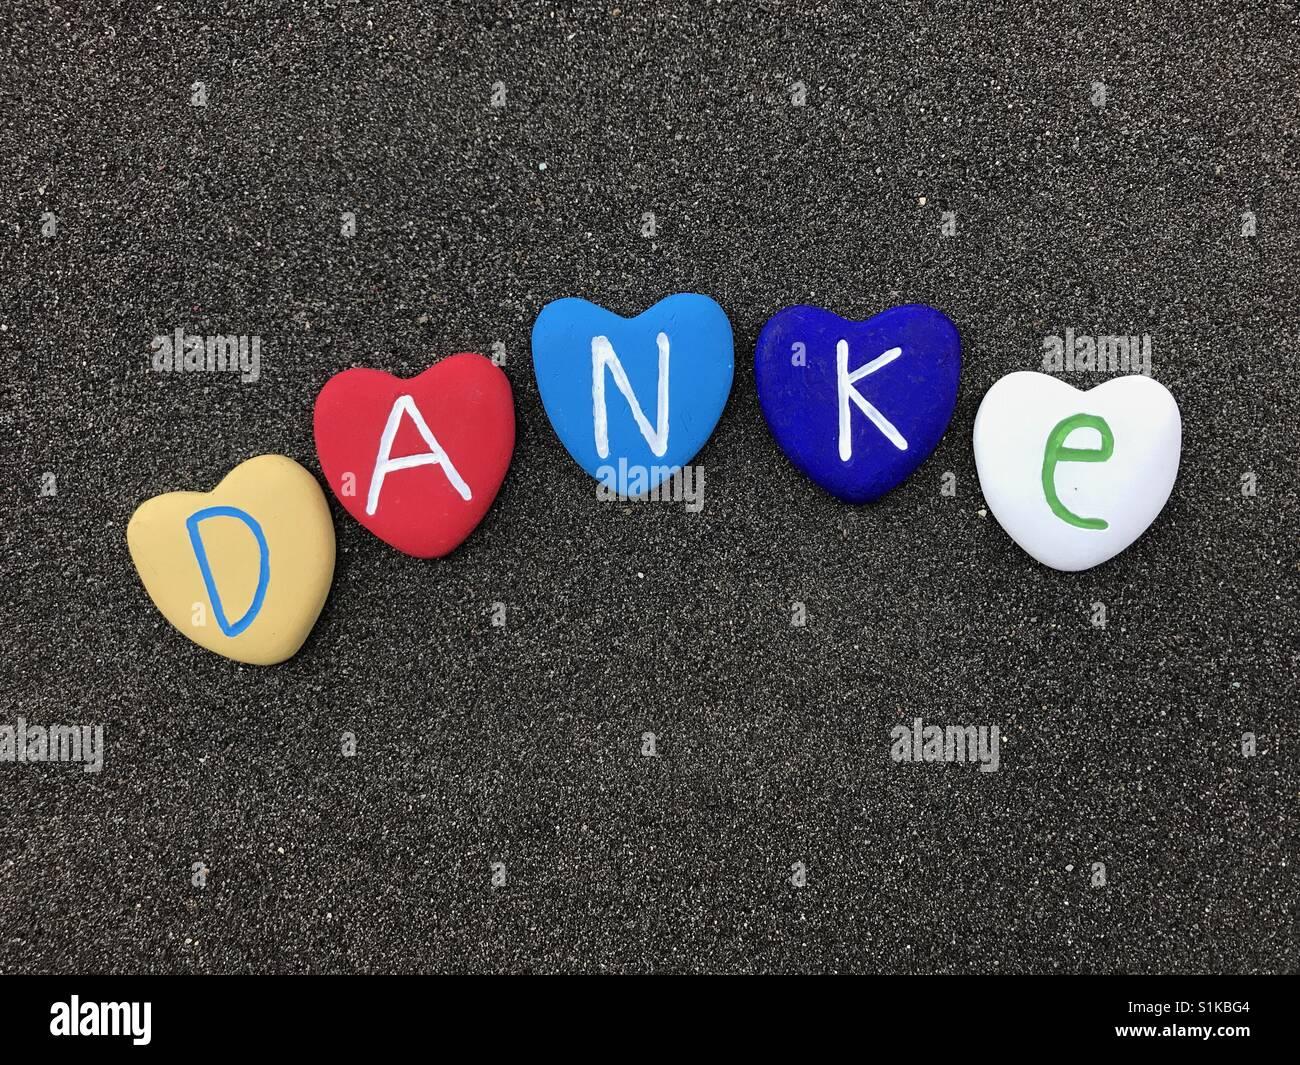 Danke, Thank you in german language Stock Photo